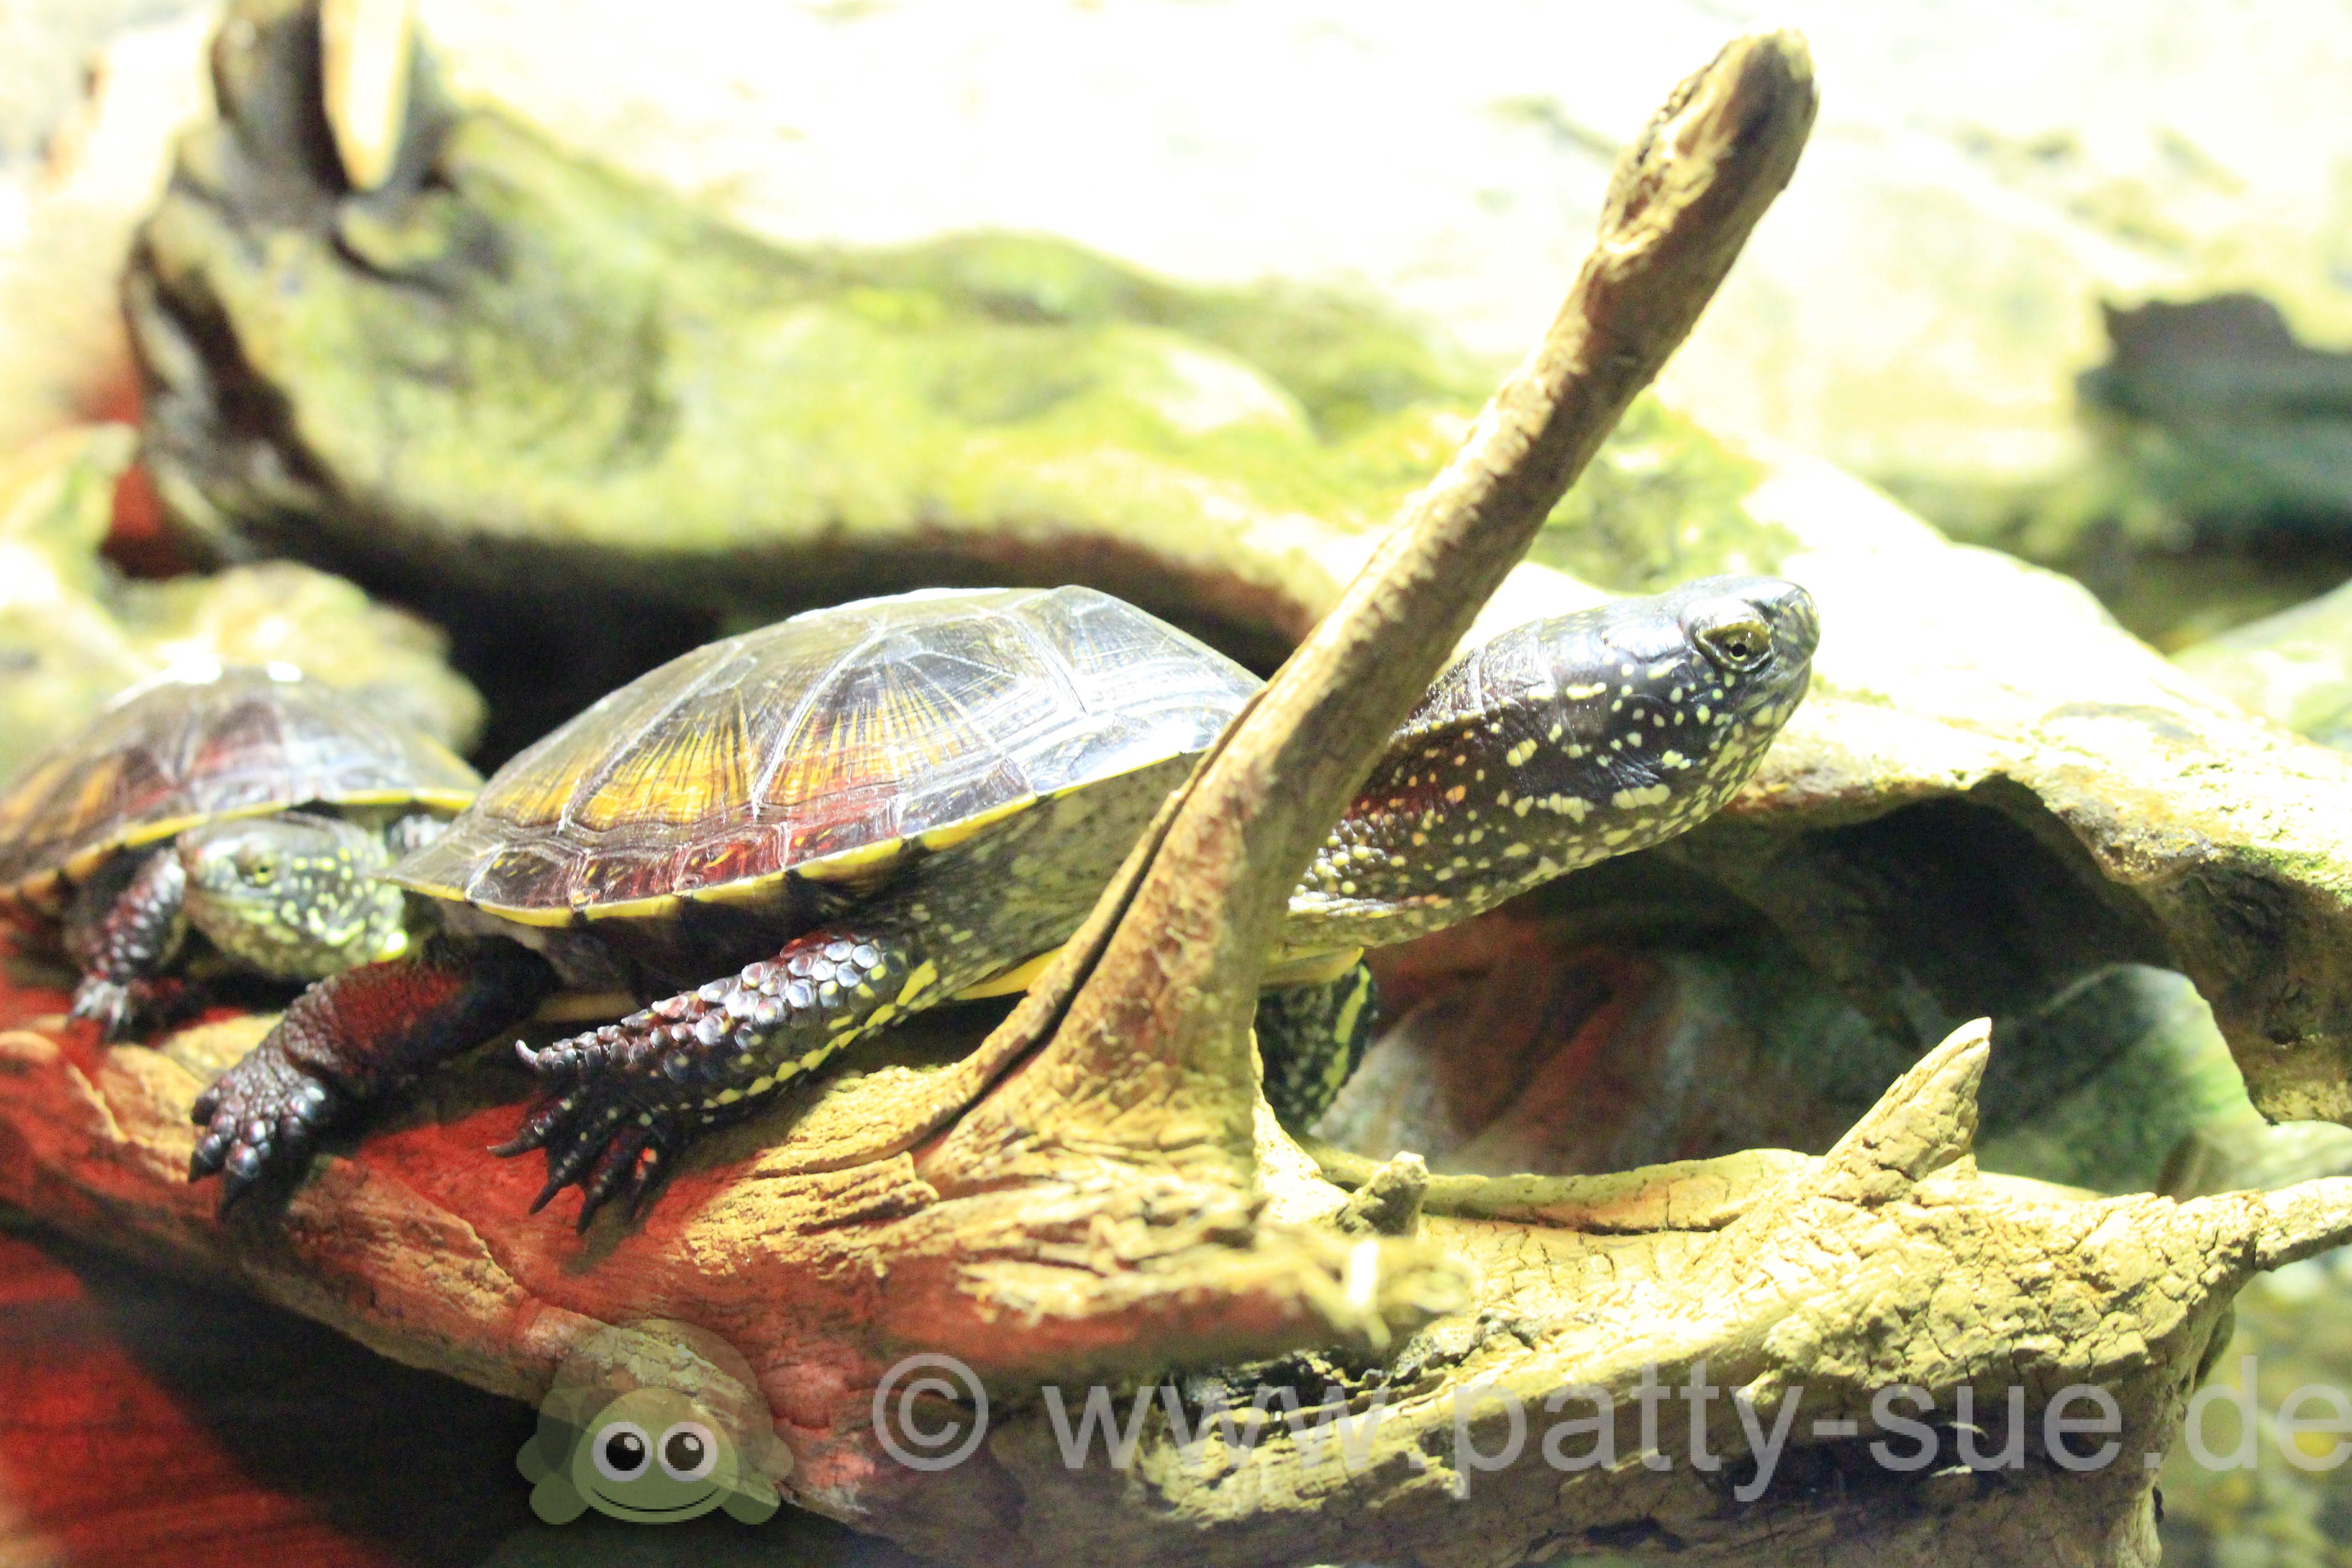 Sea Life in Oberhausen - Patty Sue - DIE Schildkröte